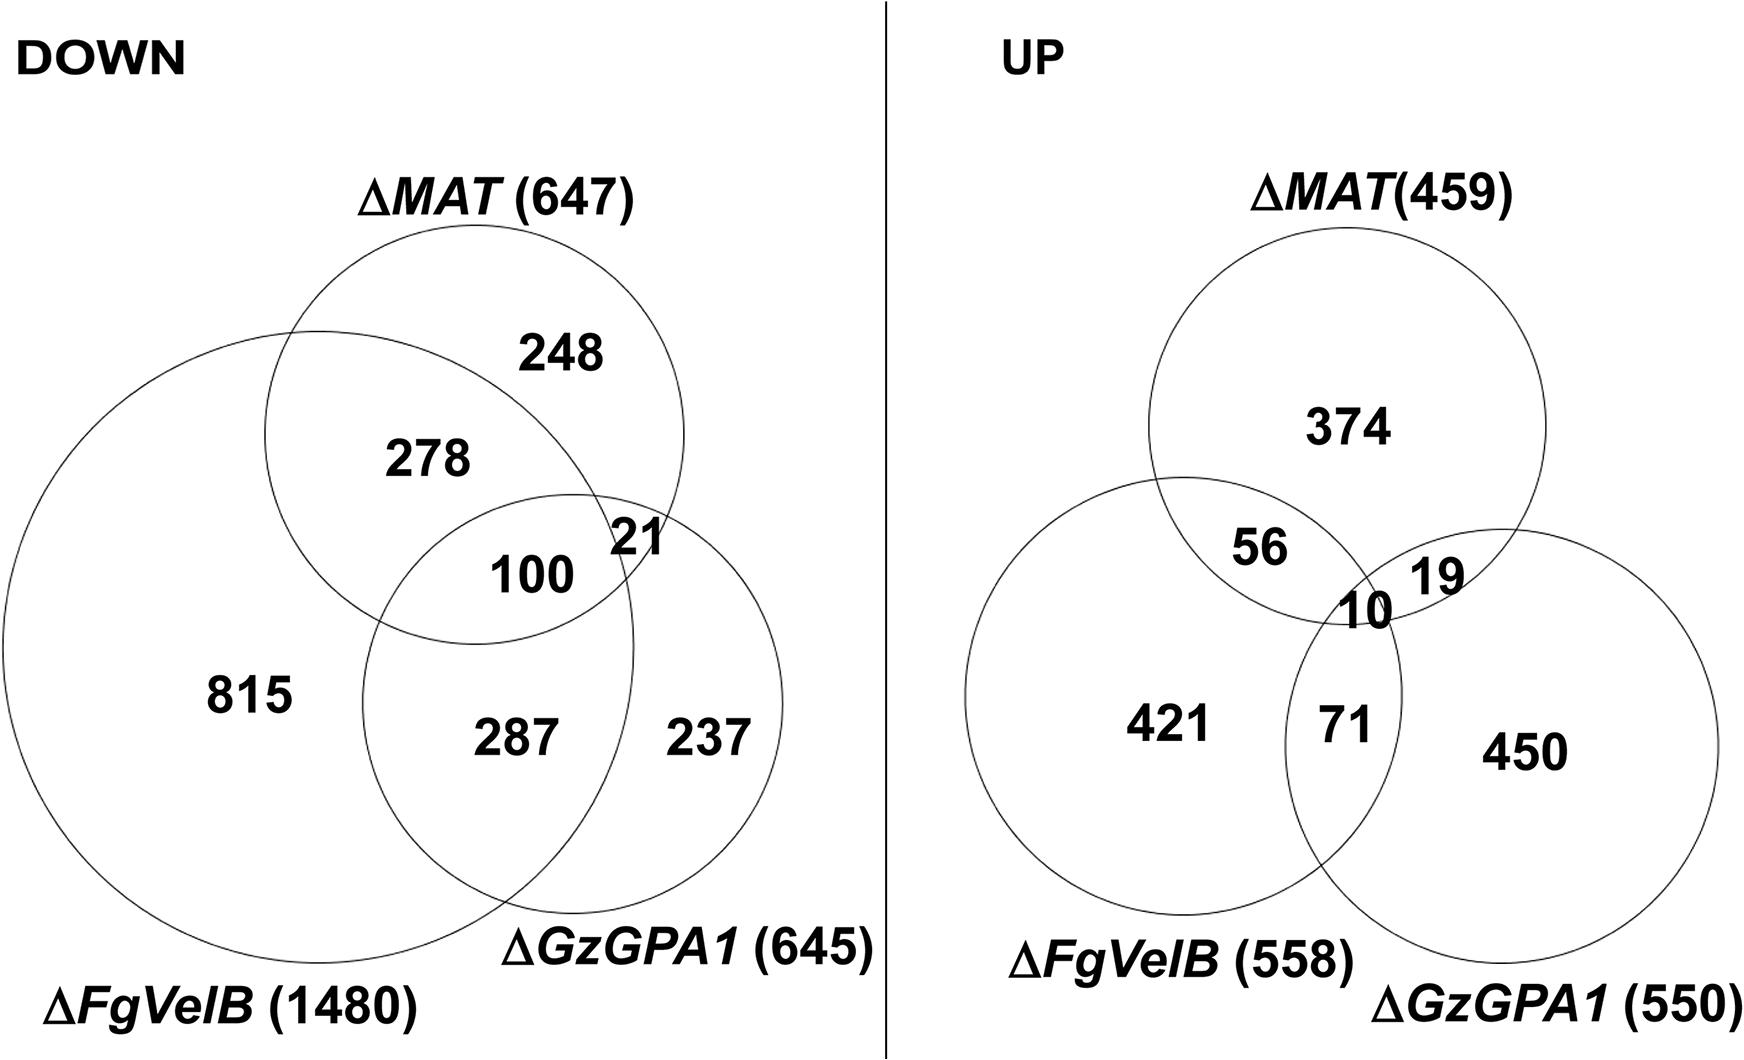 Number of DEGs in the <i>F</i>. <i>graminearum</i> strains lacking the individual <i>MAT</i> or both <i>MAT</i> loci (Δ<i>MAT</i>) overlapped with those from the Δ<i>FgVelB</i> and Δ<i>GzGPA1</i> strains, respectively.